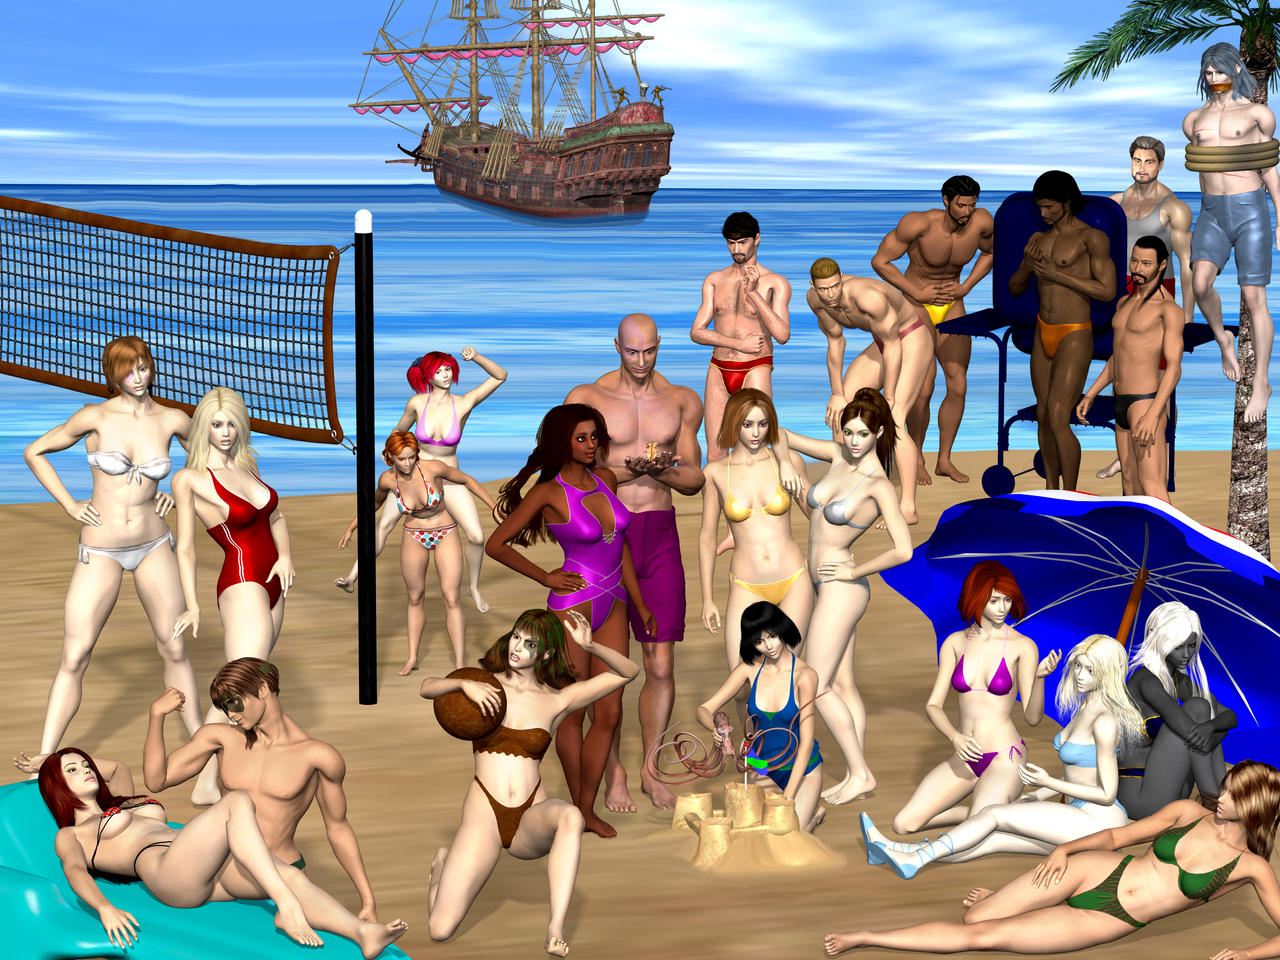 Baldur's gate nude skin adult gallery